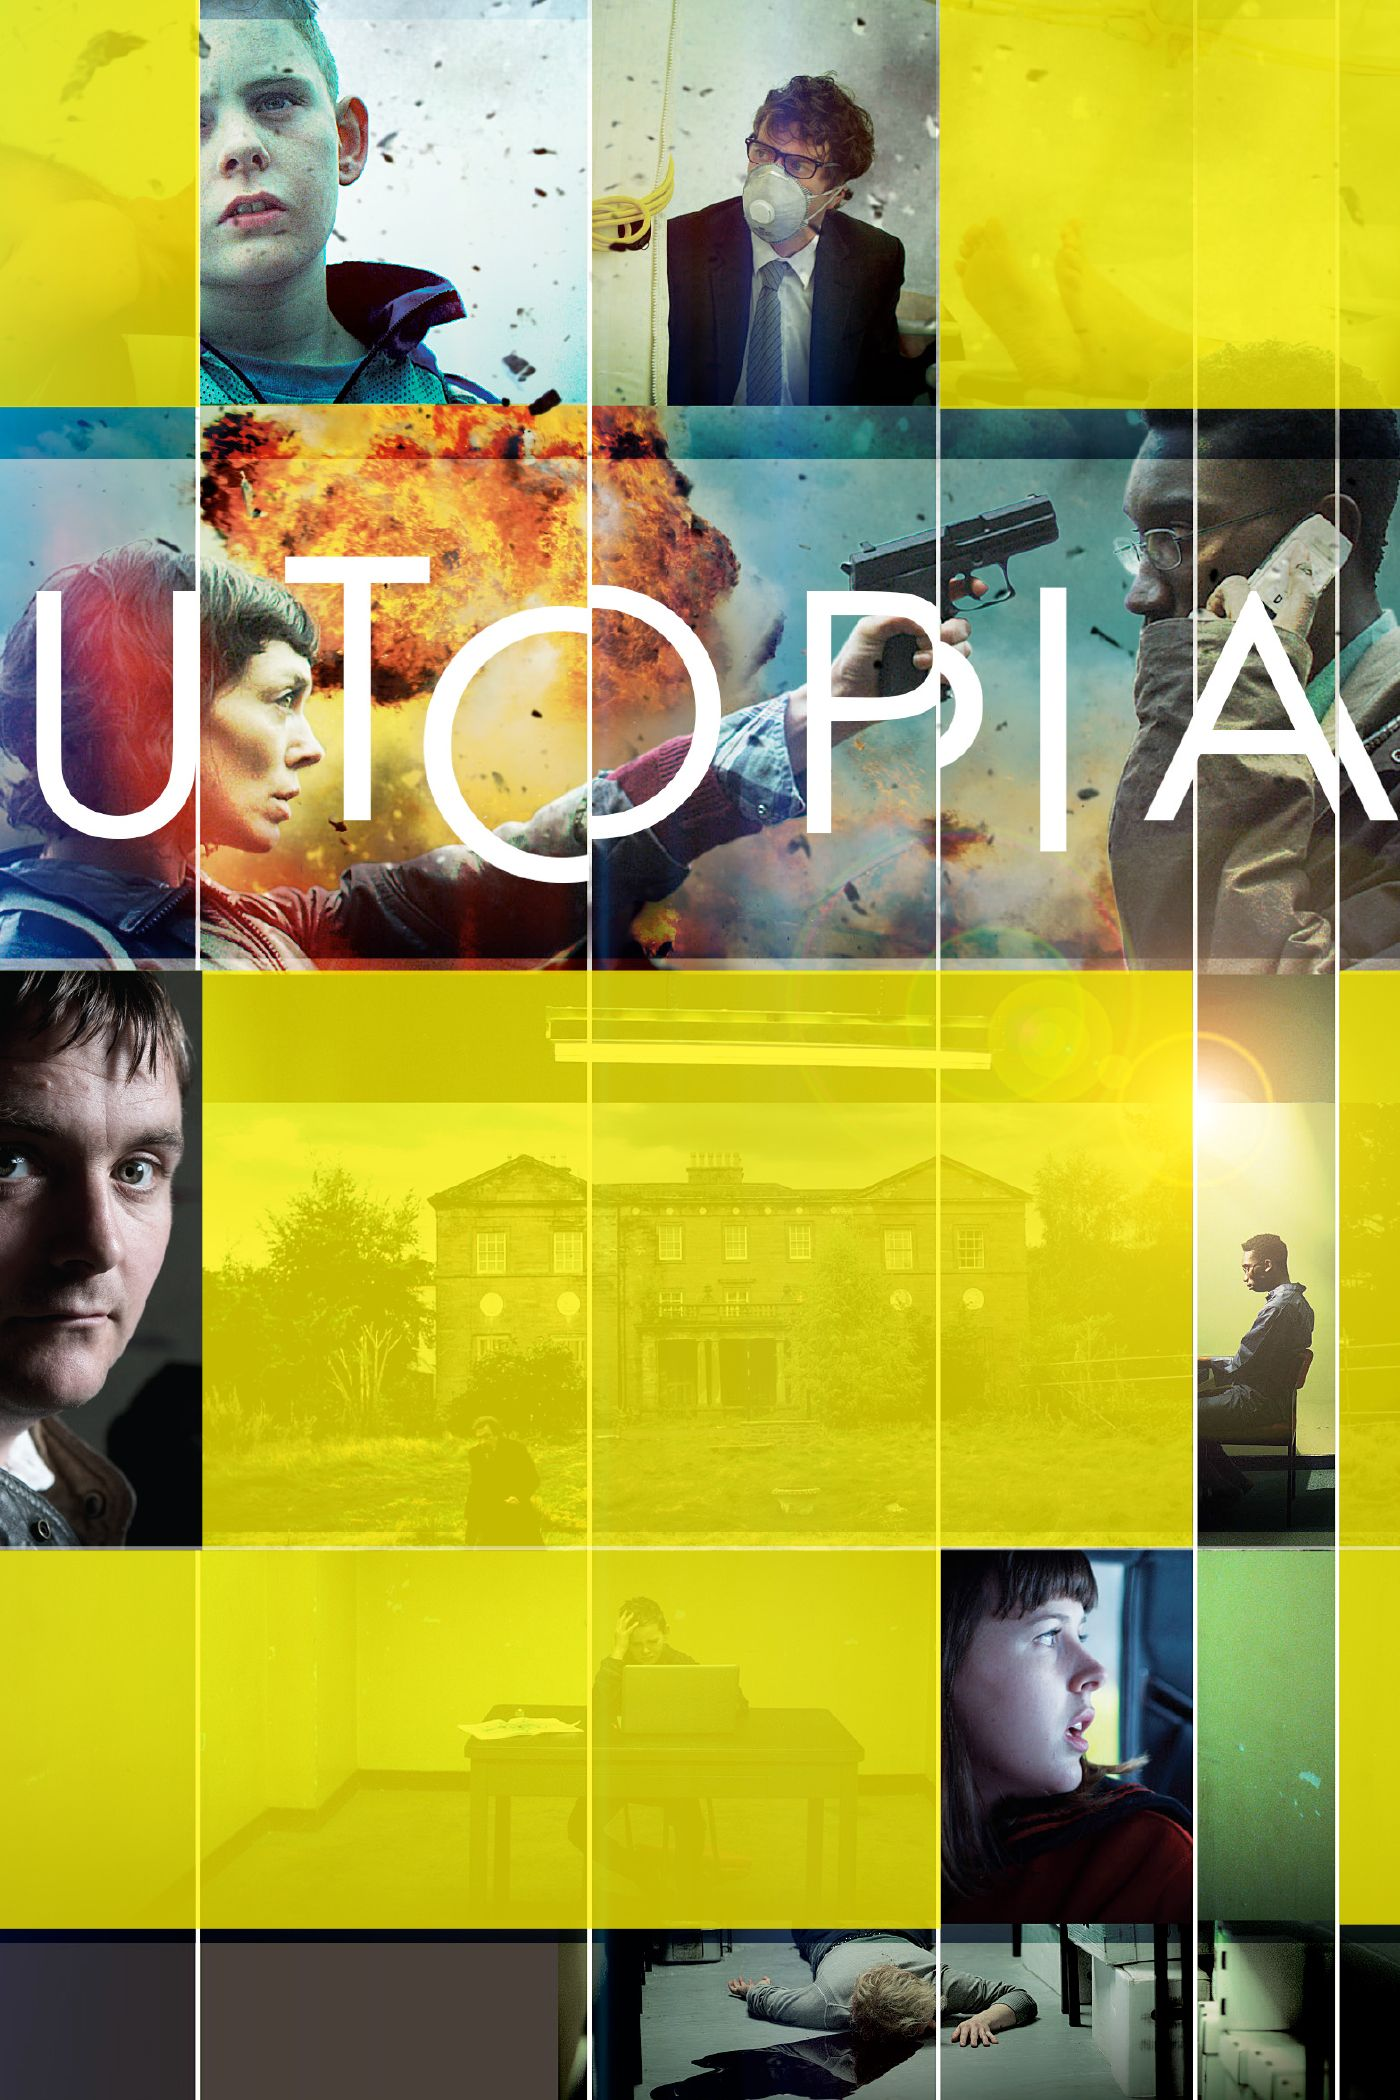 UTOPIA - such a good series! Conspiracy theories, dark